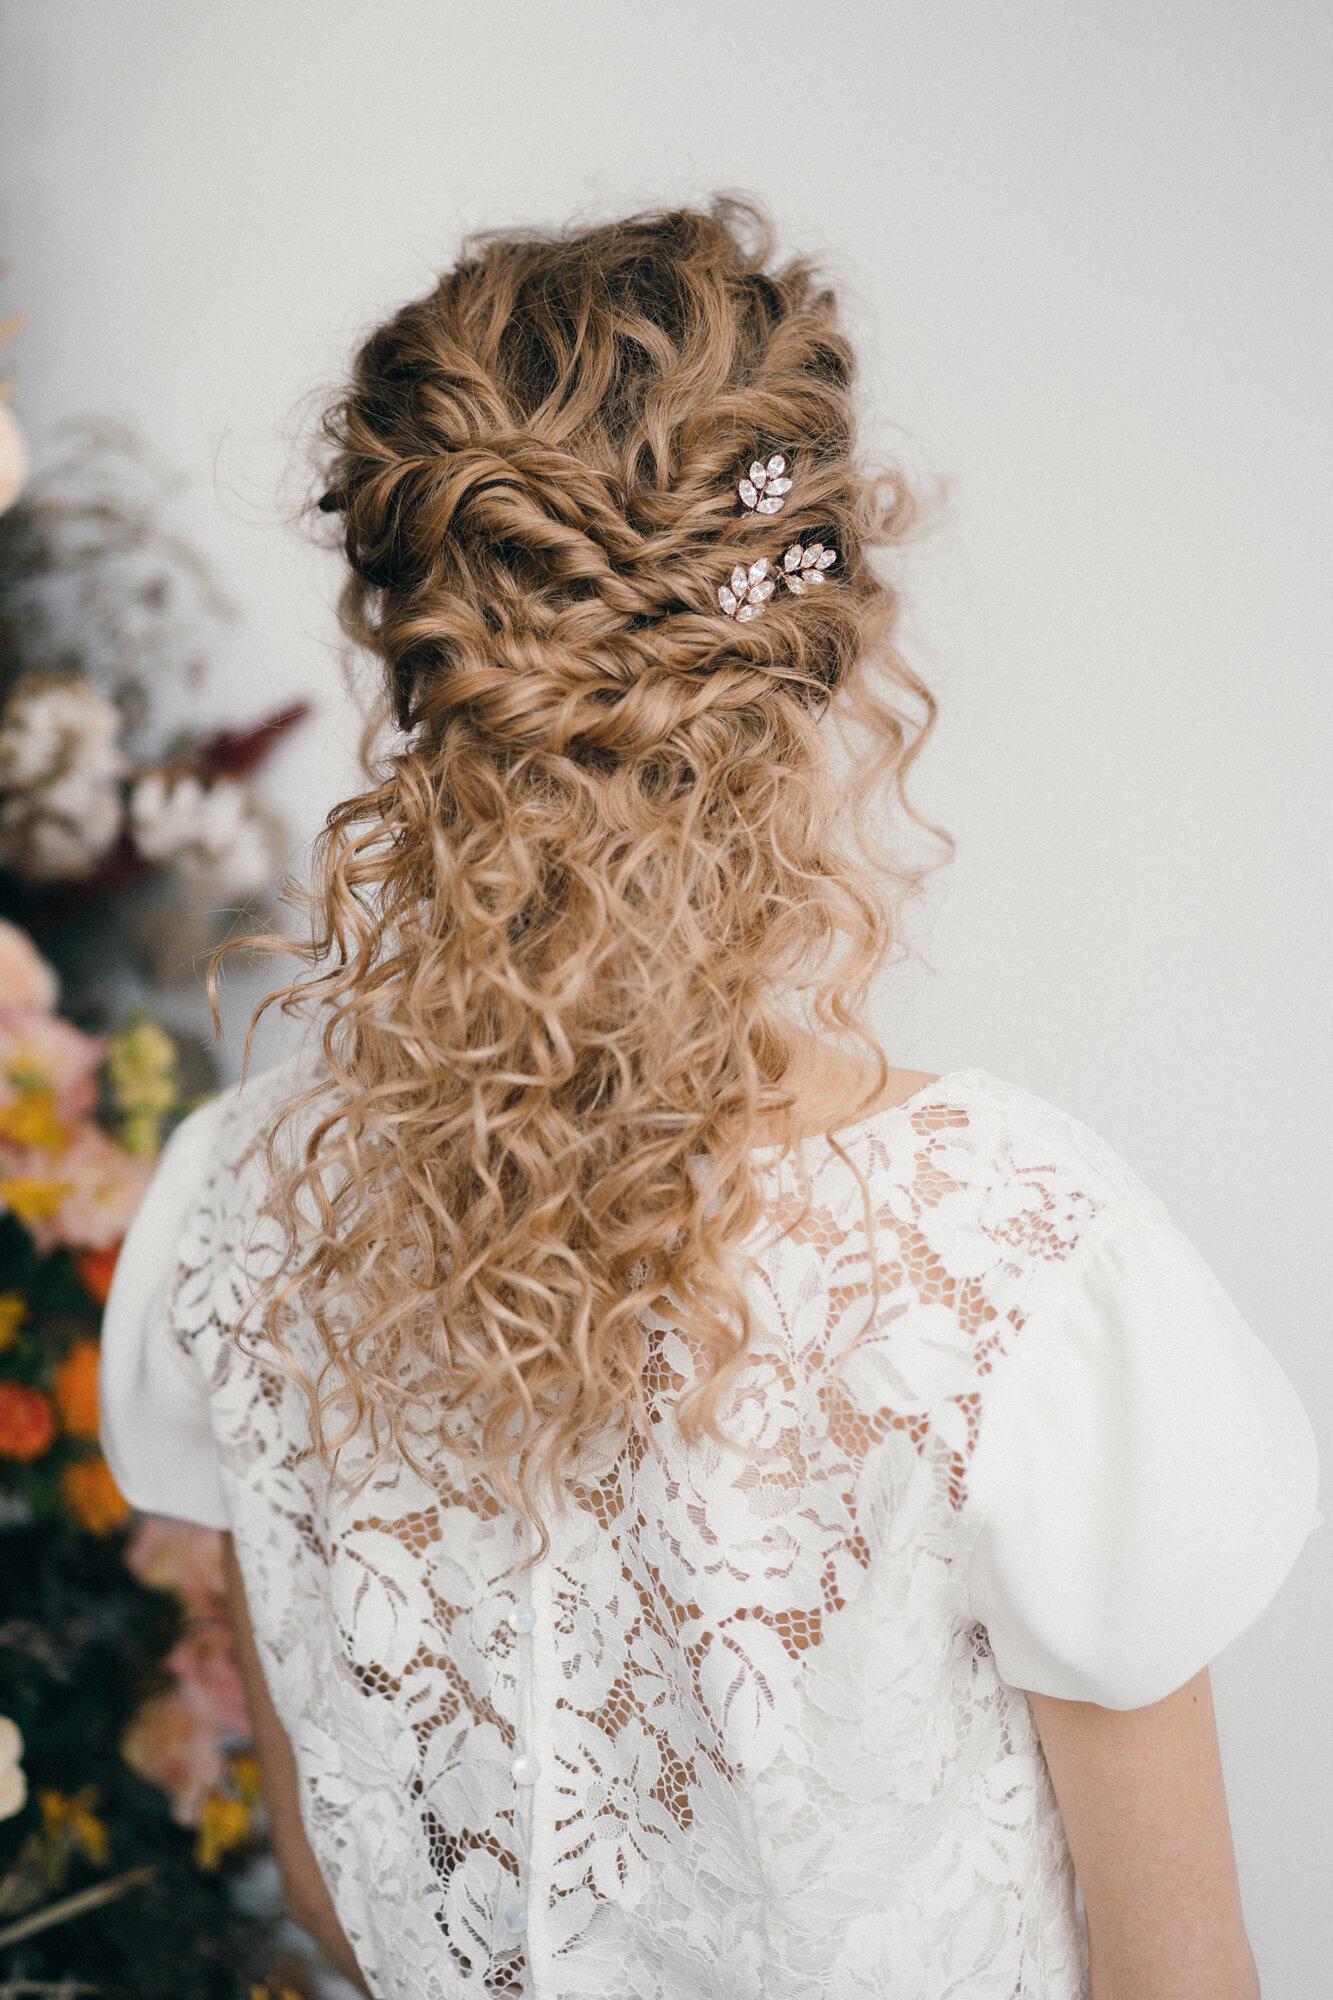 Debbie-Carlisle-Bridal-Accessories-Kate-Beaumont-Wedding-Gowns-Sheffield-Yorkshire-UK-30.jpg